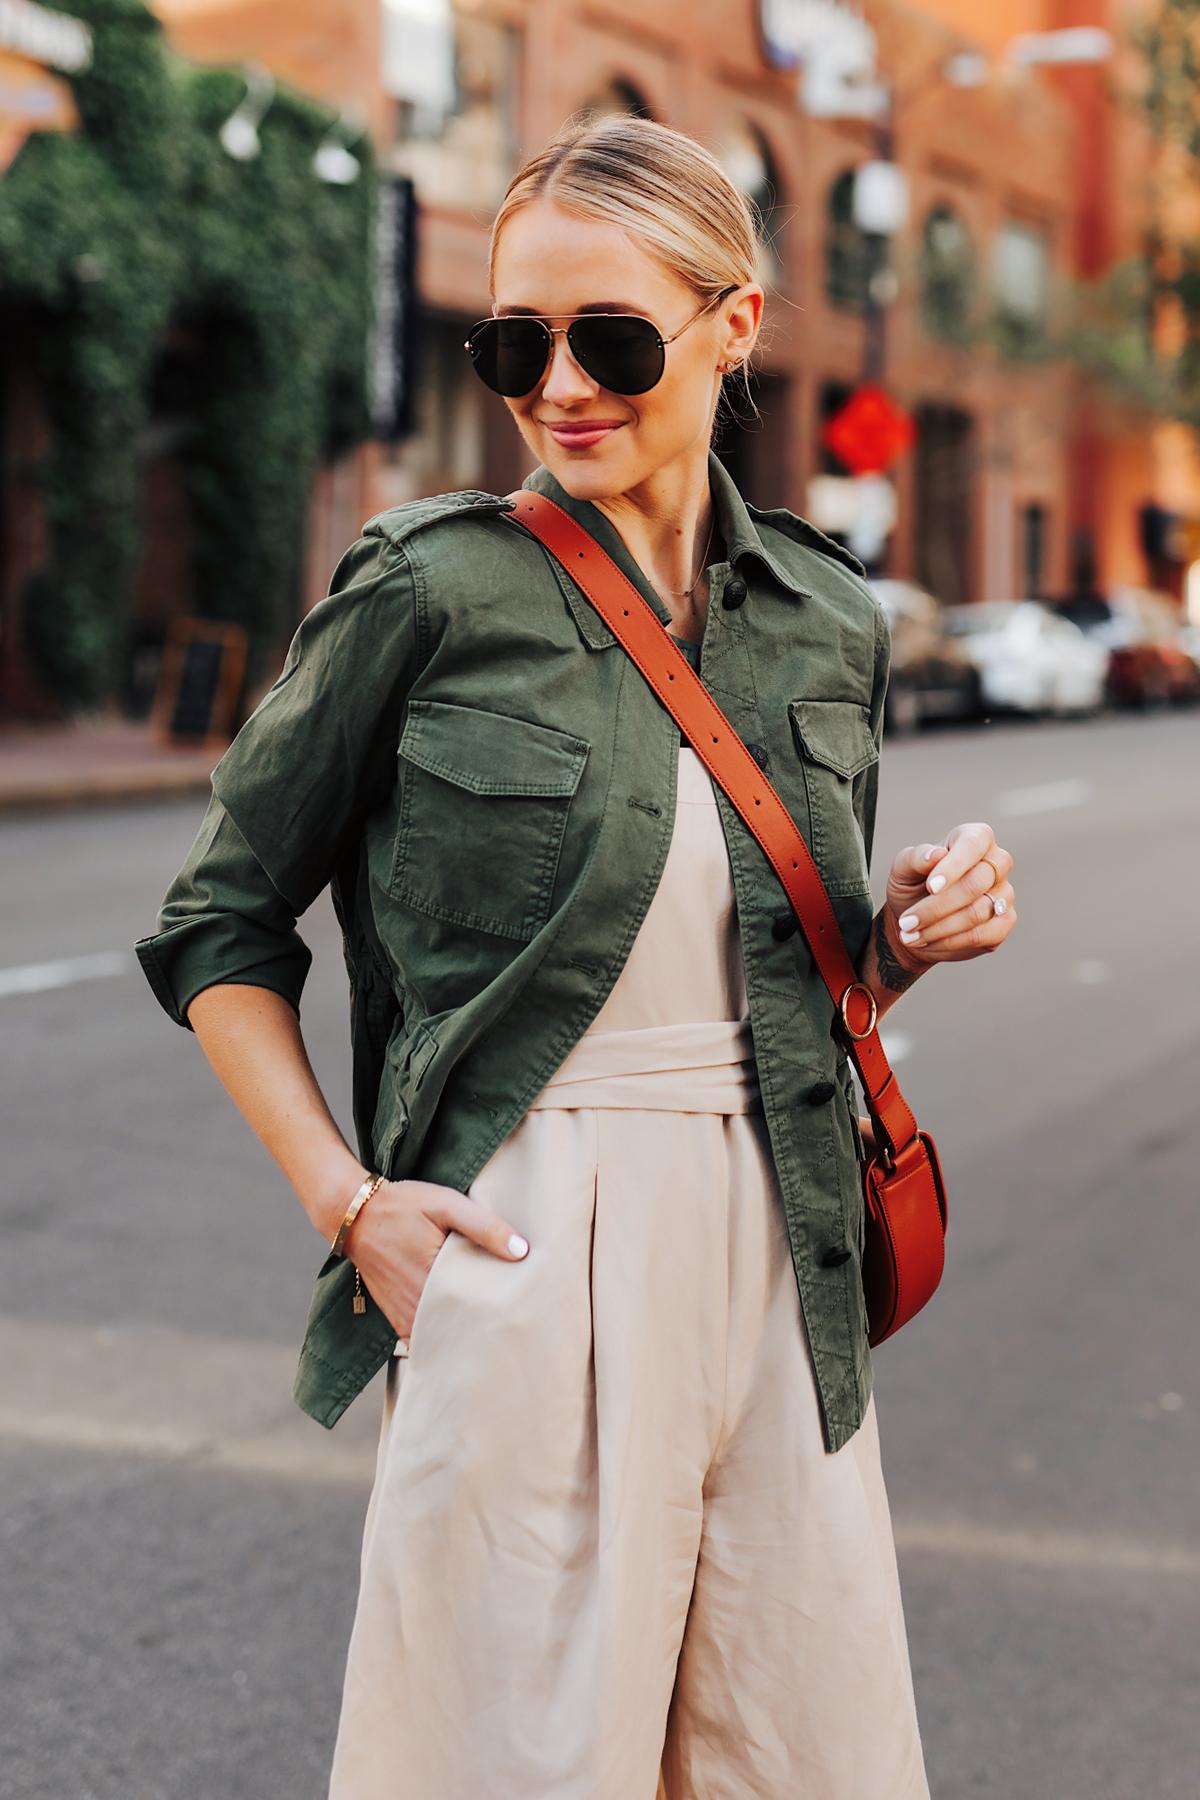 Blonde Woman Wearing Banana Republic Beige Linen Jumpsuit Green Utility Jacket Fashion Jackson San Diego Fashion Blogger Street Style